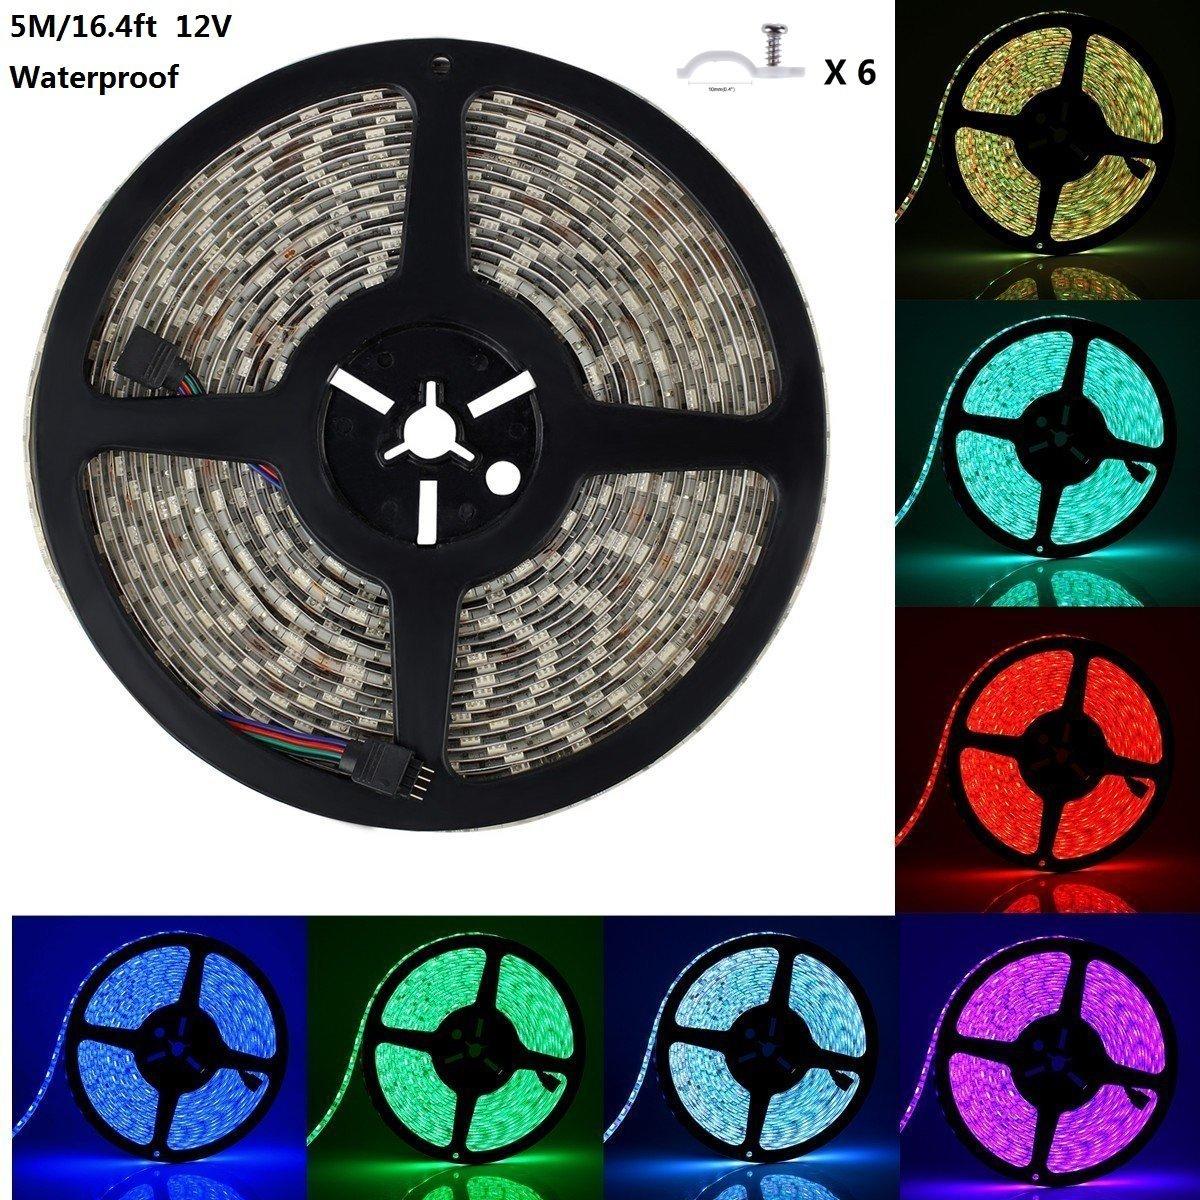 Topled Light RGB LED Strip Lights, 16.4FT/5M RGB Color Changing Flexible LED Rope Light IP65 Waterproof 5050SMD 300 LEDs 12V Strip Lighting for Bedroom Holiday Party(Single Light Strip)